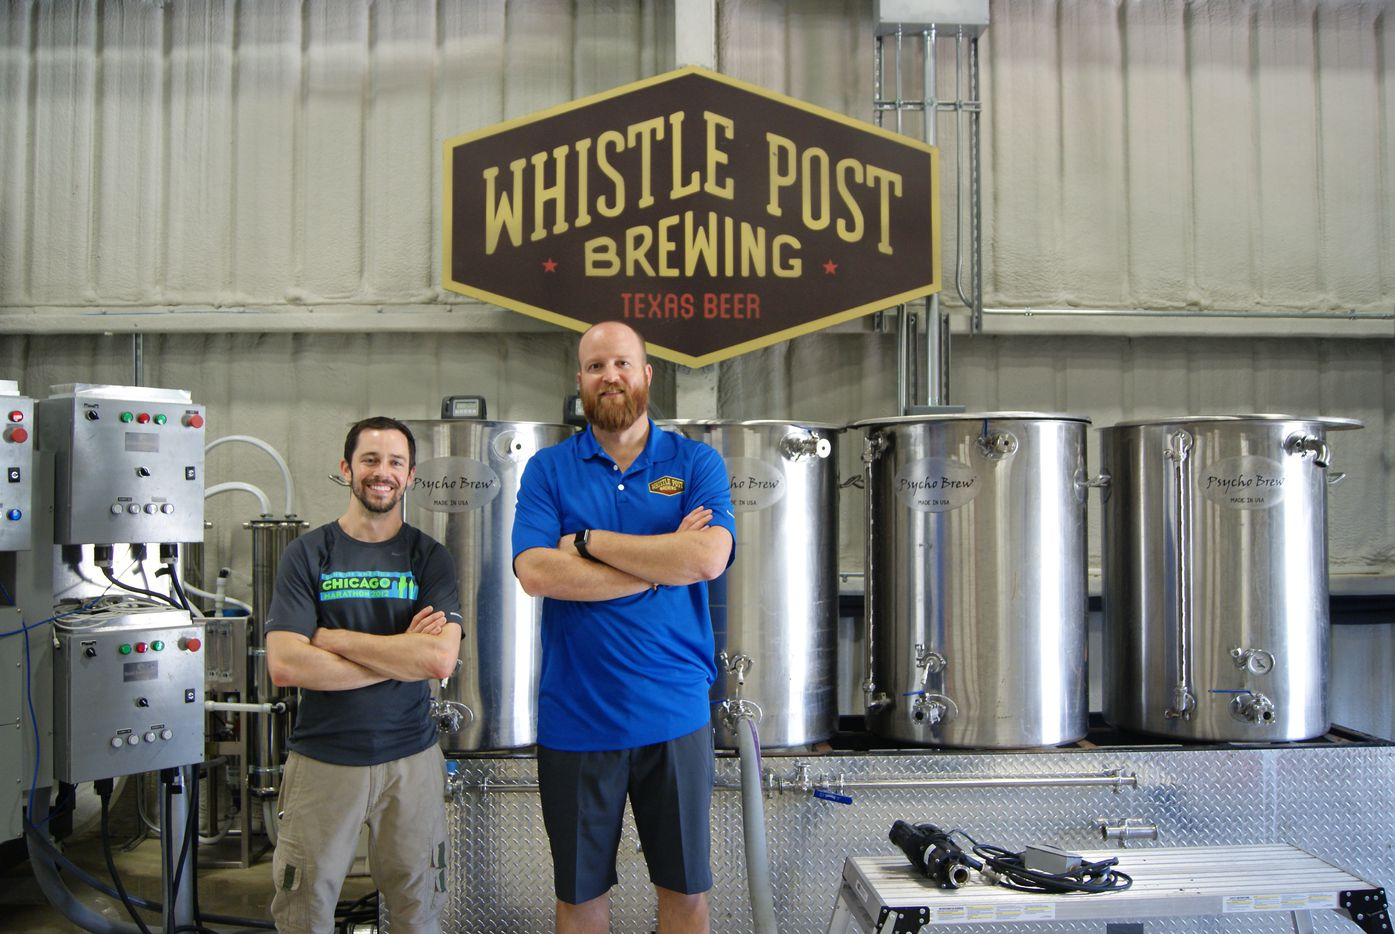 Blake Morrison (left) and Evan Batt (right) of Whistle Post Brewing Co.